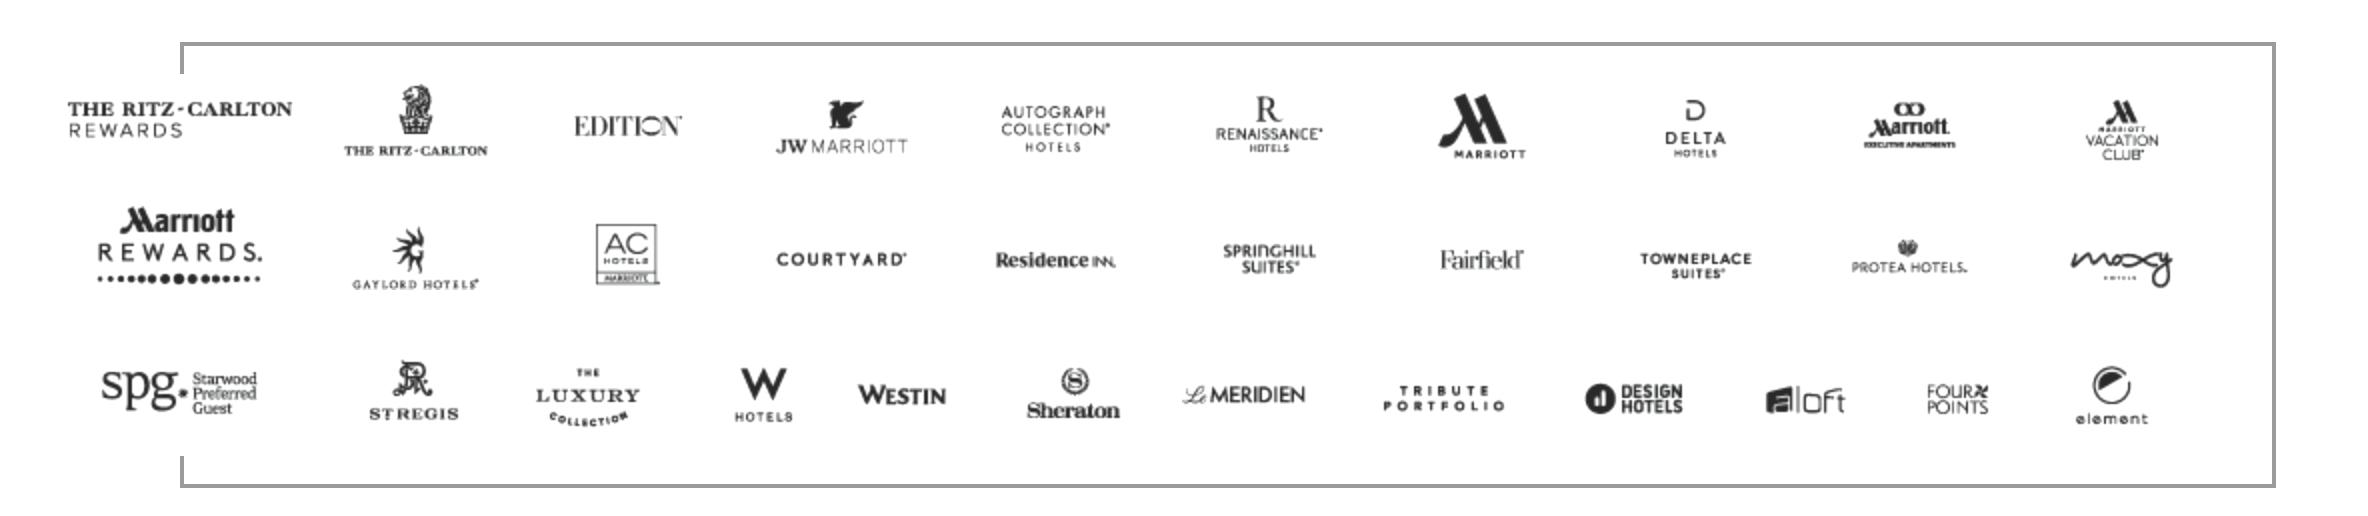 New-Marriott-Hotels